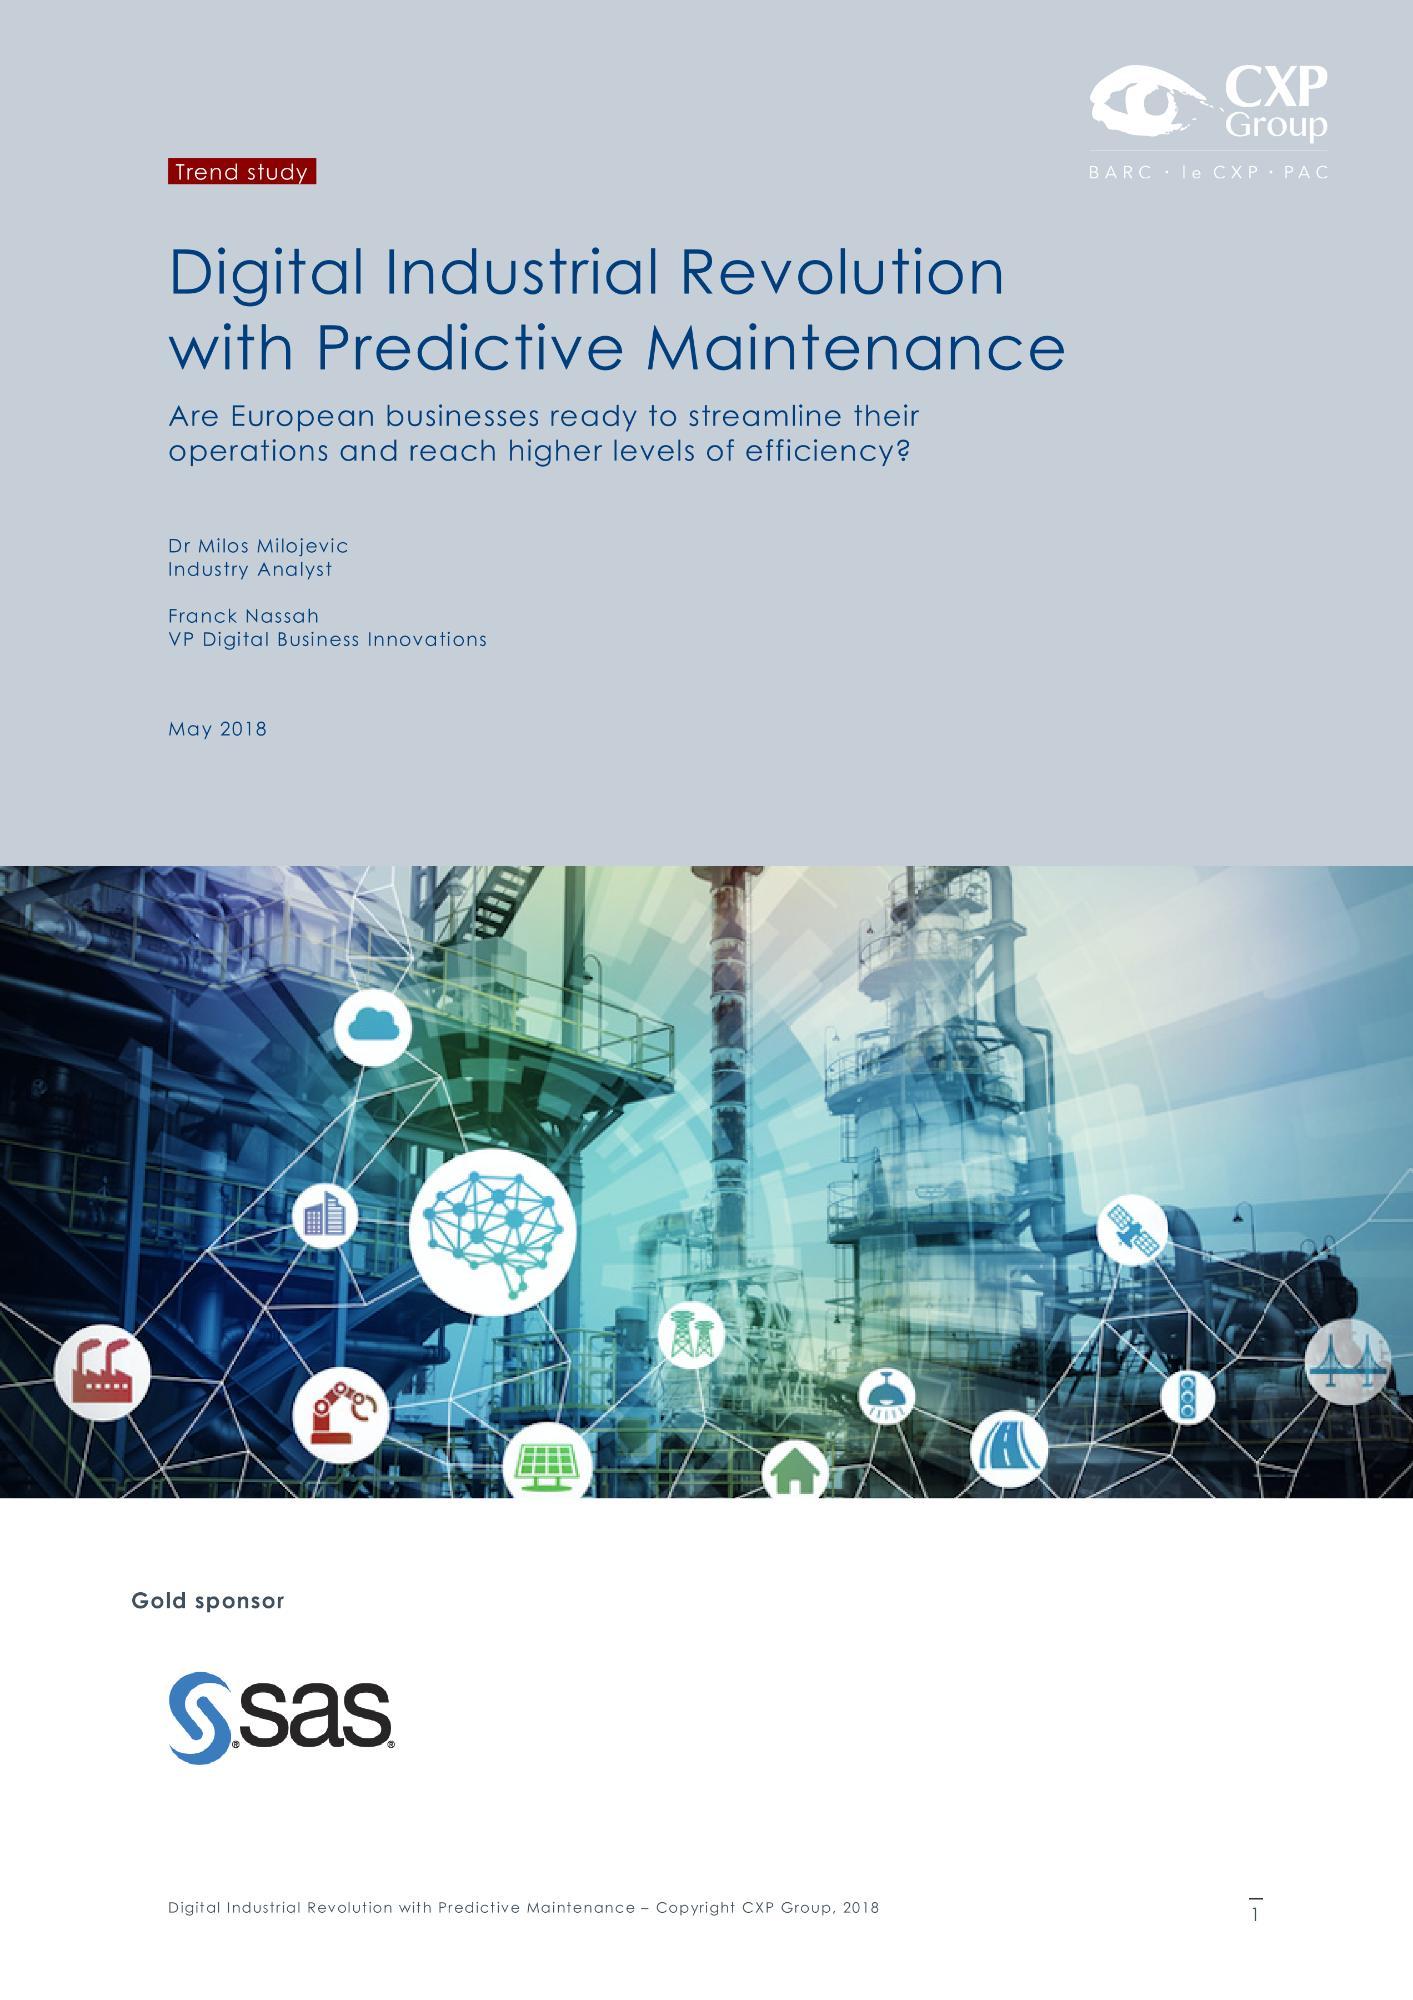 Digital Industrial Revolution with Predictive Maintenance